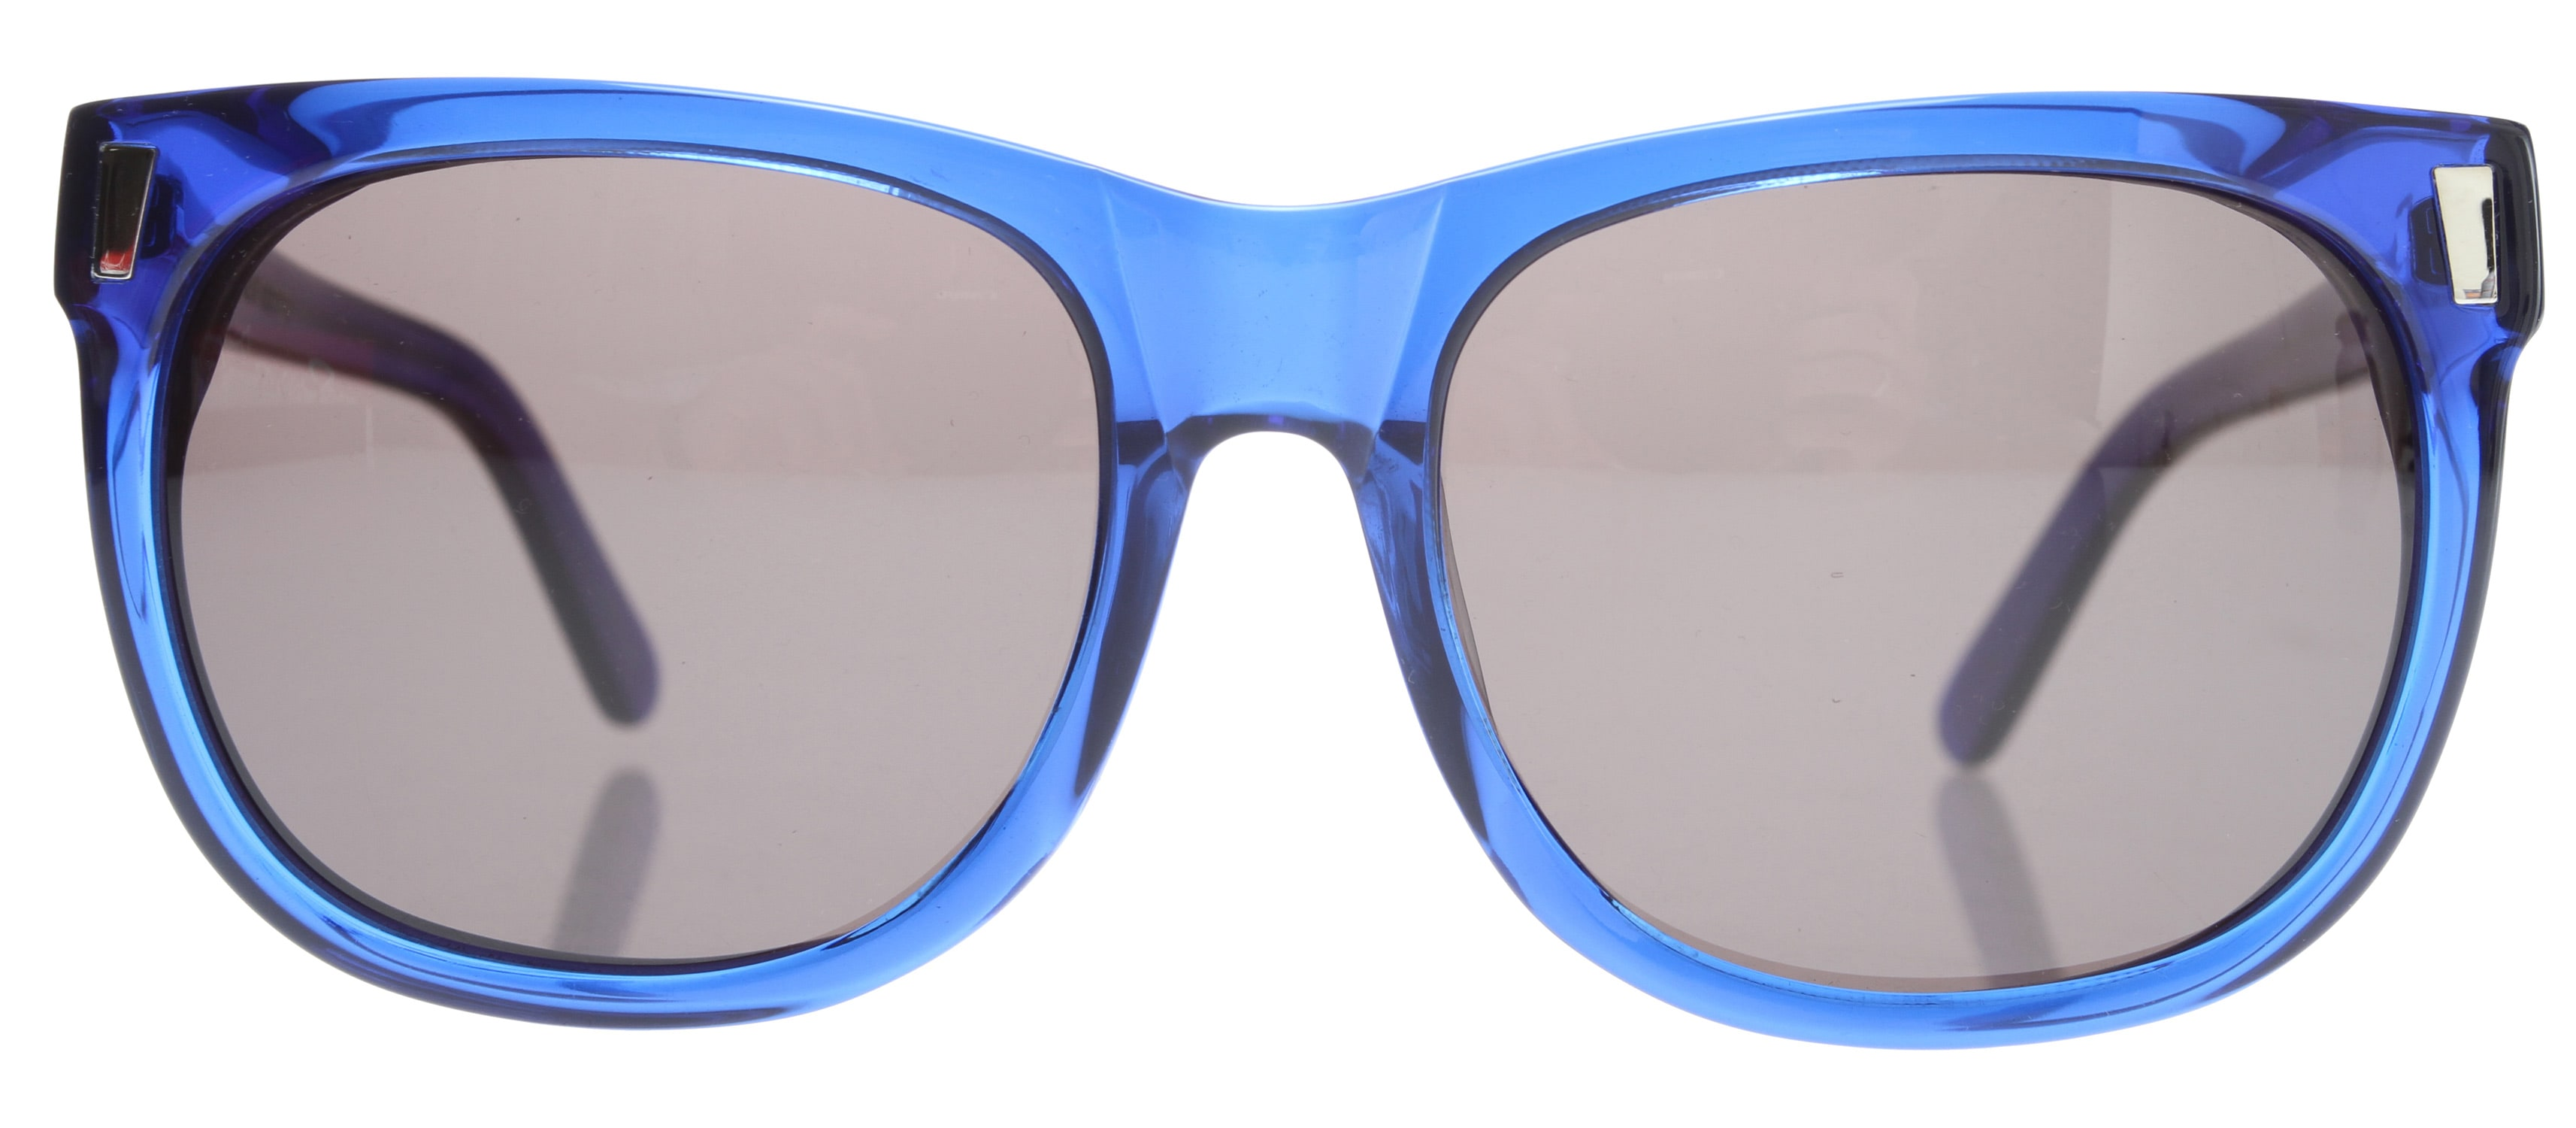 7445ea1ff1 Ashbury Day Tripper Antwuan Dixon Sunglasses - thumbnail 3